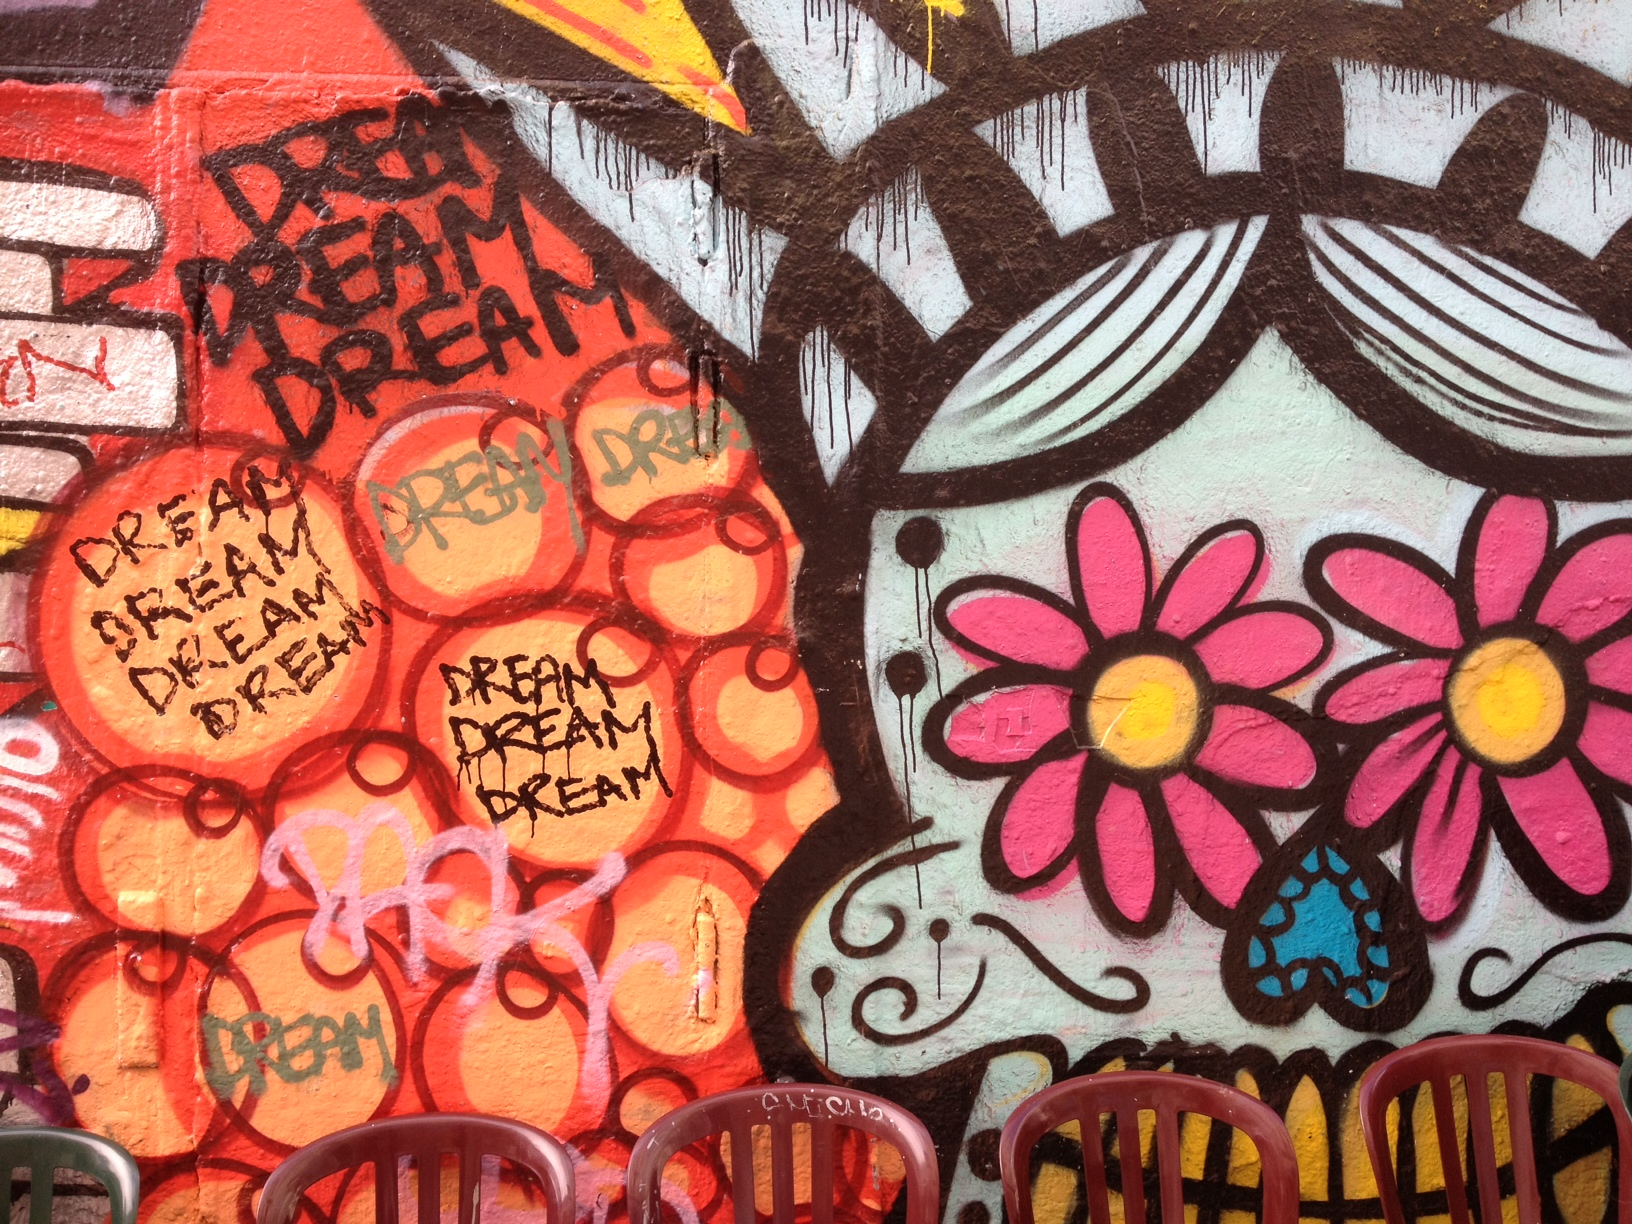 street art 75020